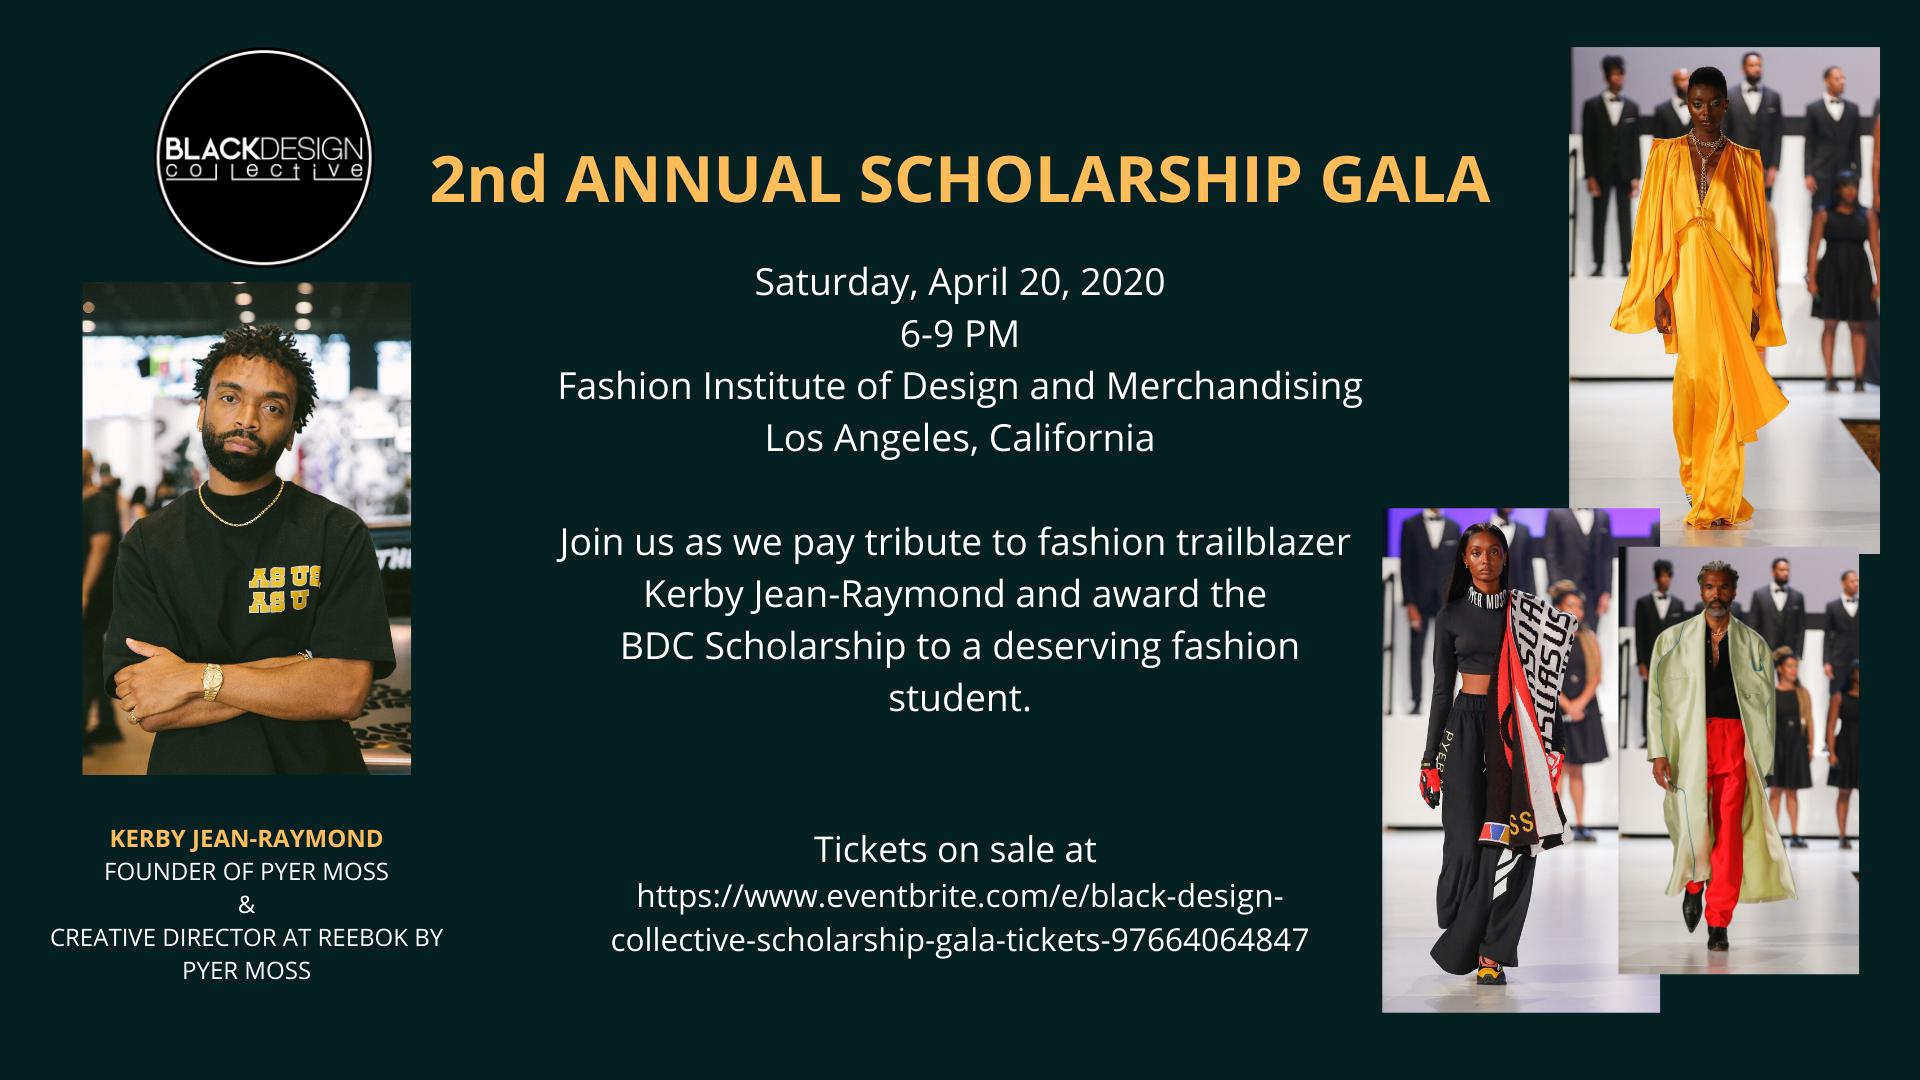 Black Design Collective Scholarship Gala 19 Apr 2020